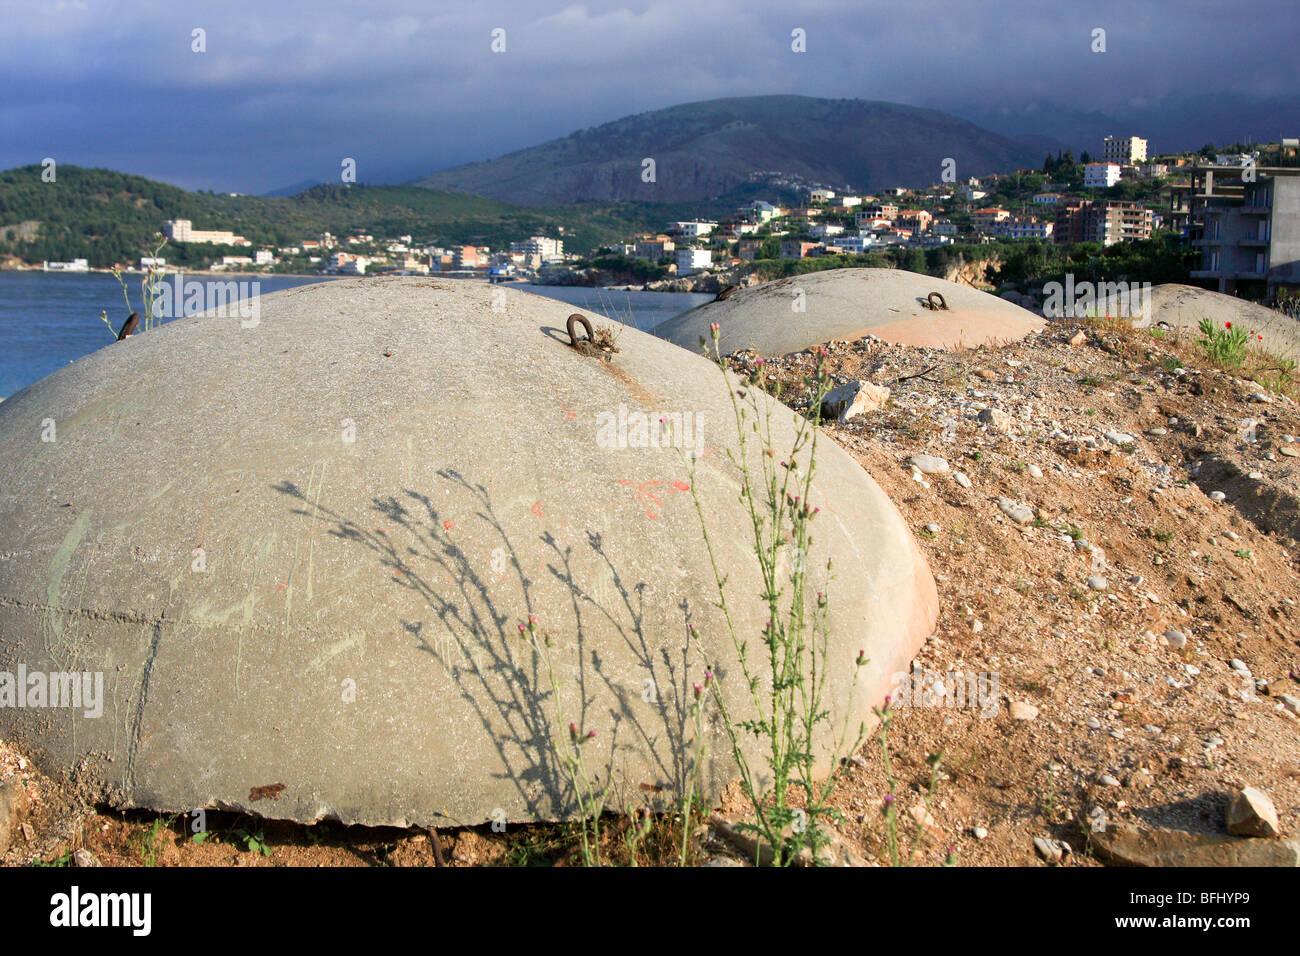 Albania, Himara, concrete bunker protecting against invasions via the sea - Stock Image